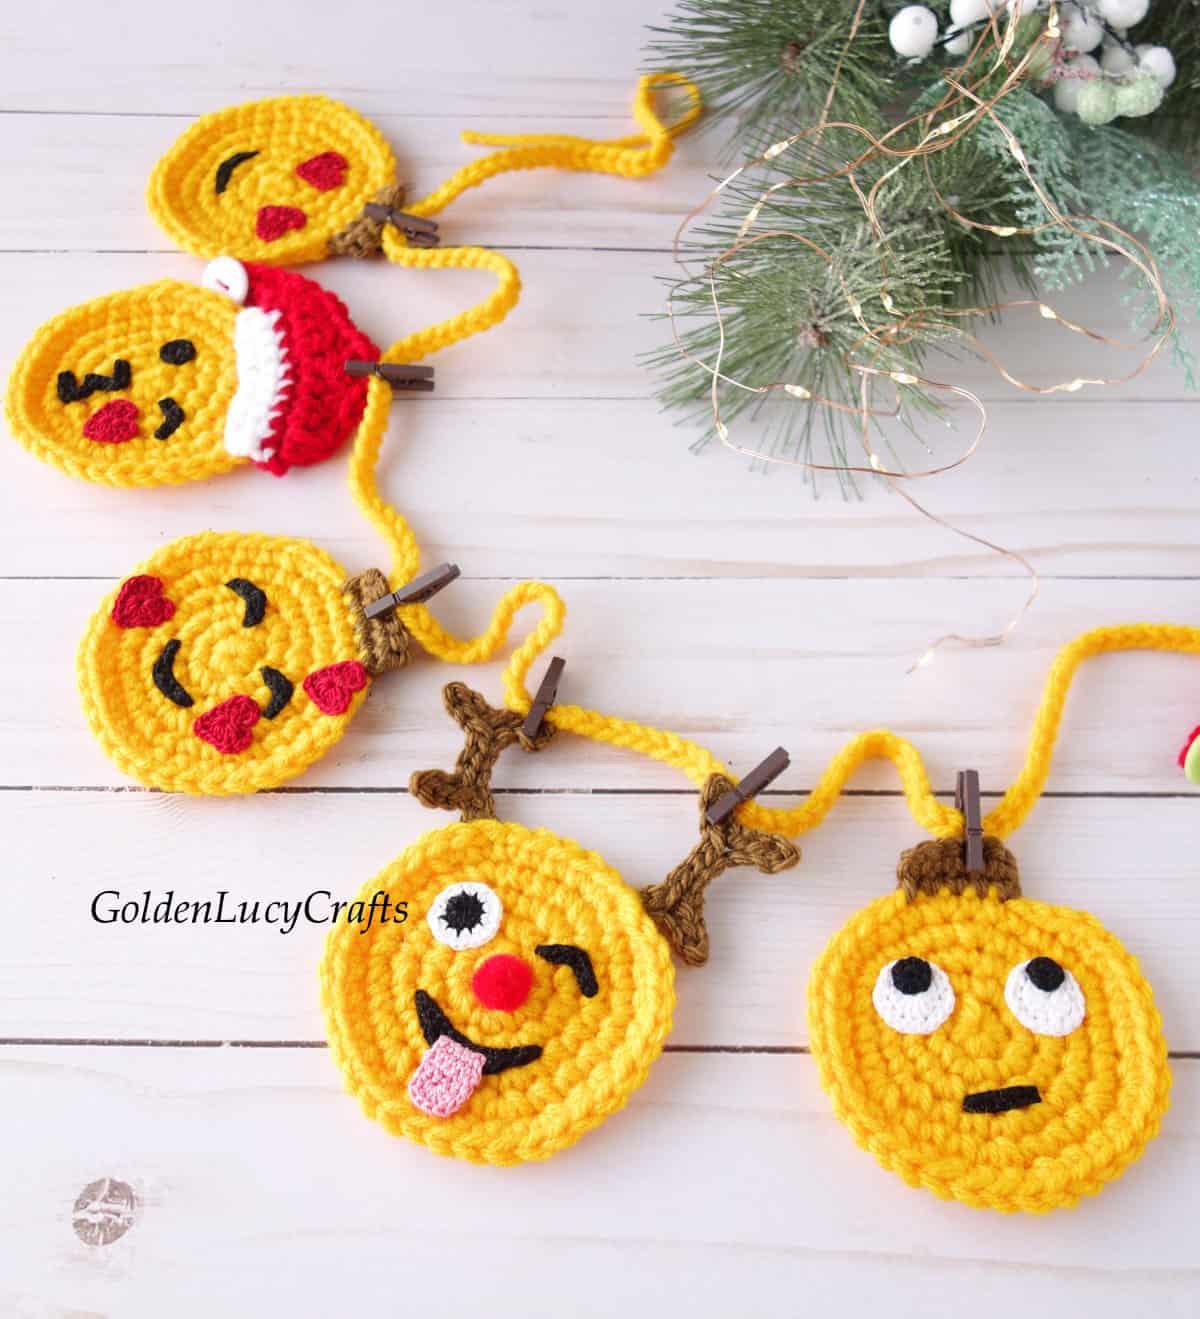 Crochet Christmas garland, crochet emoji garland.